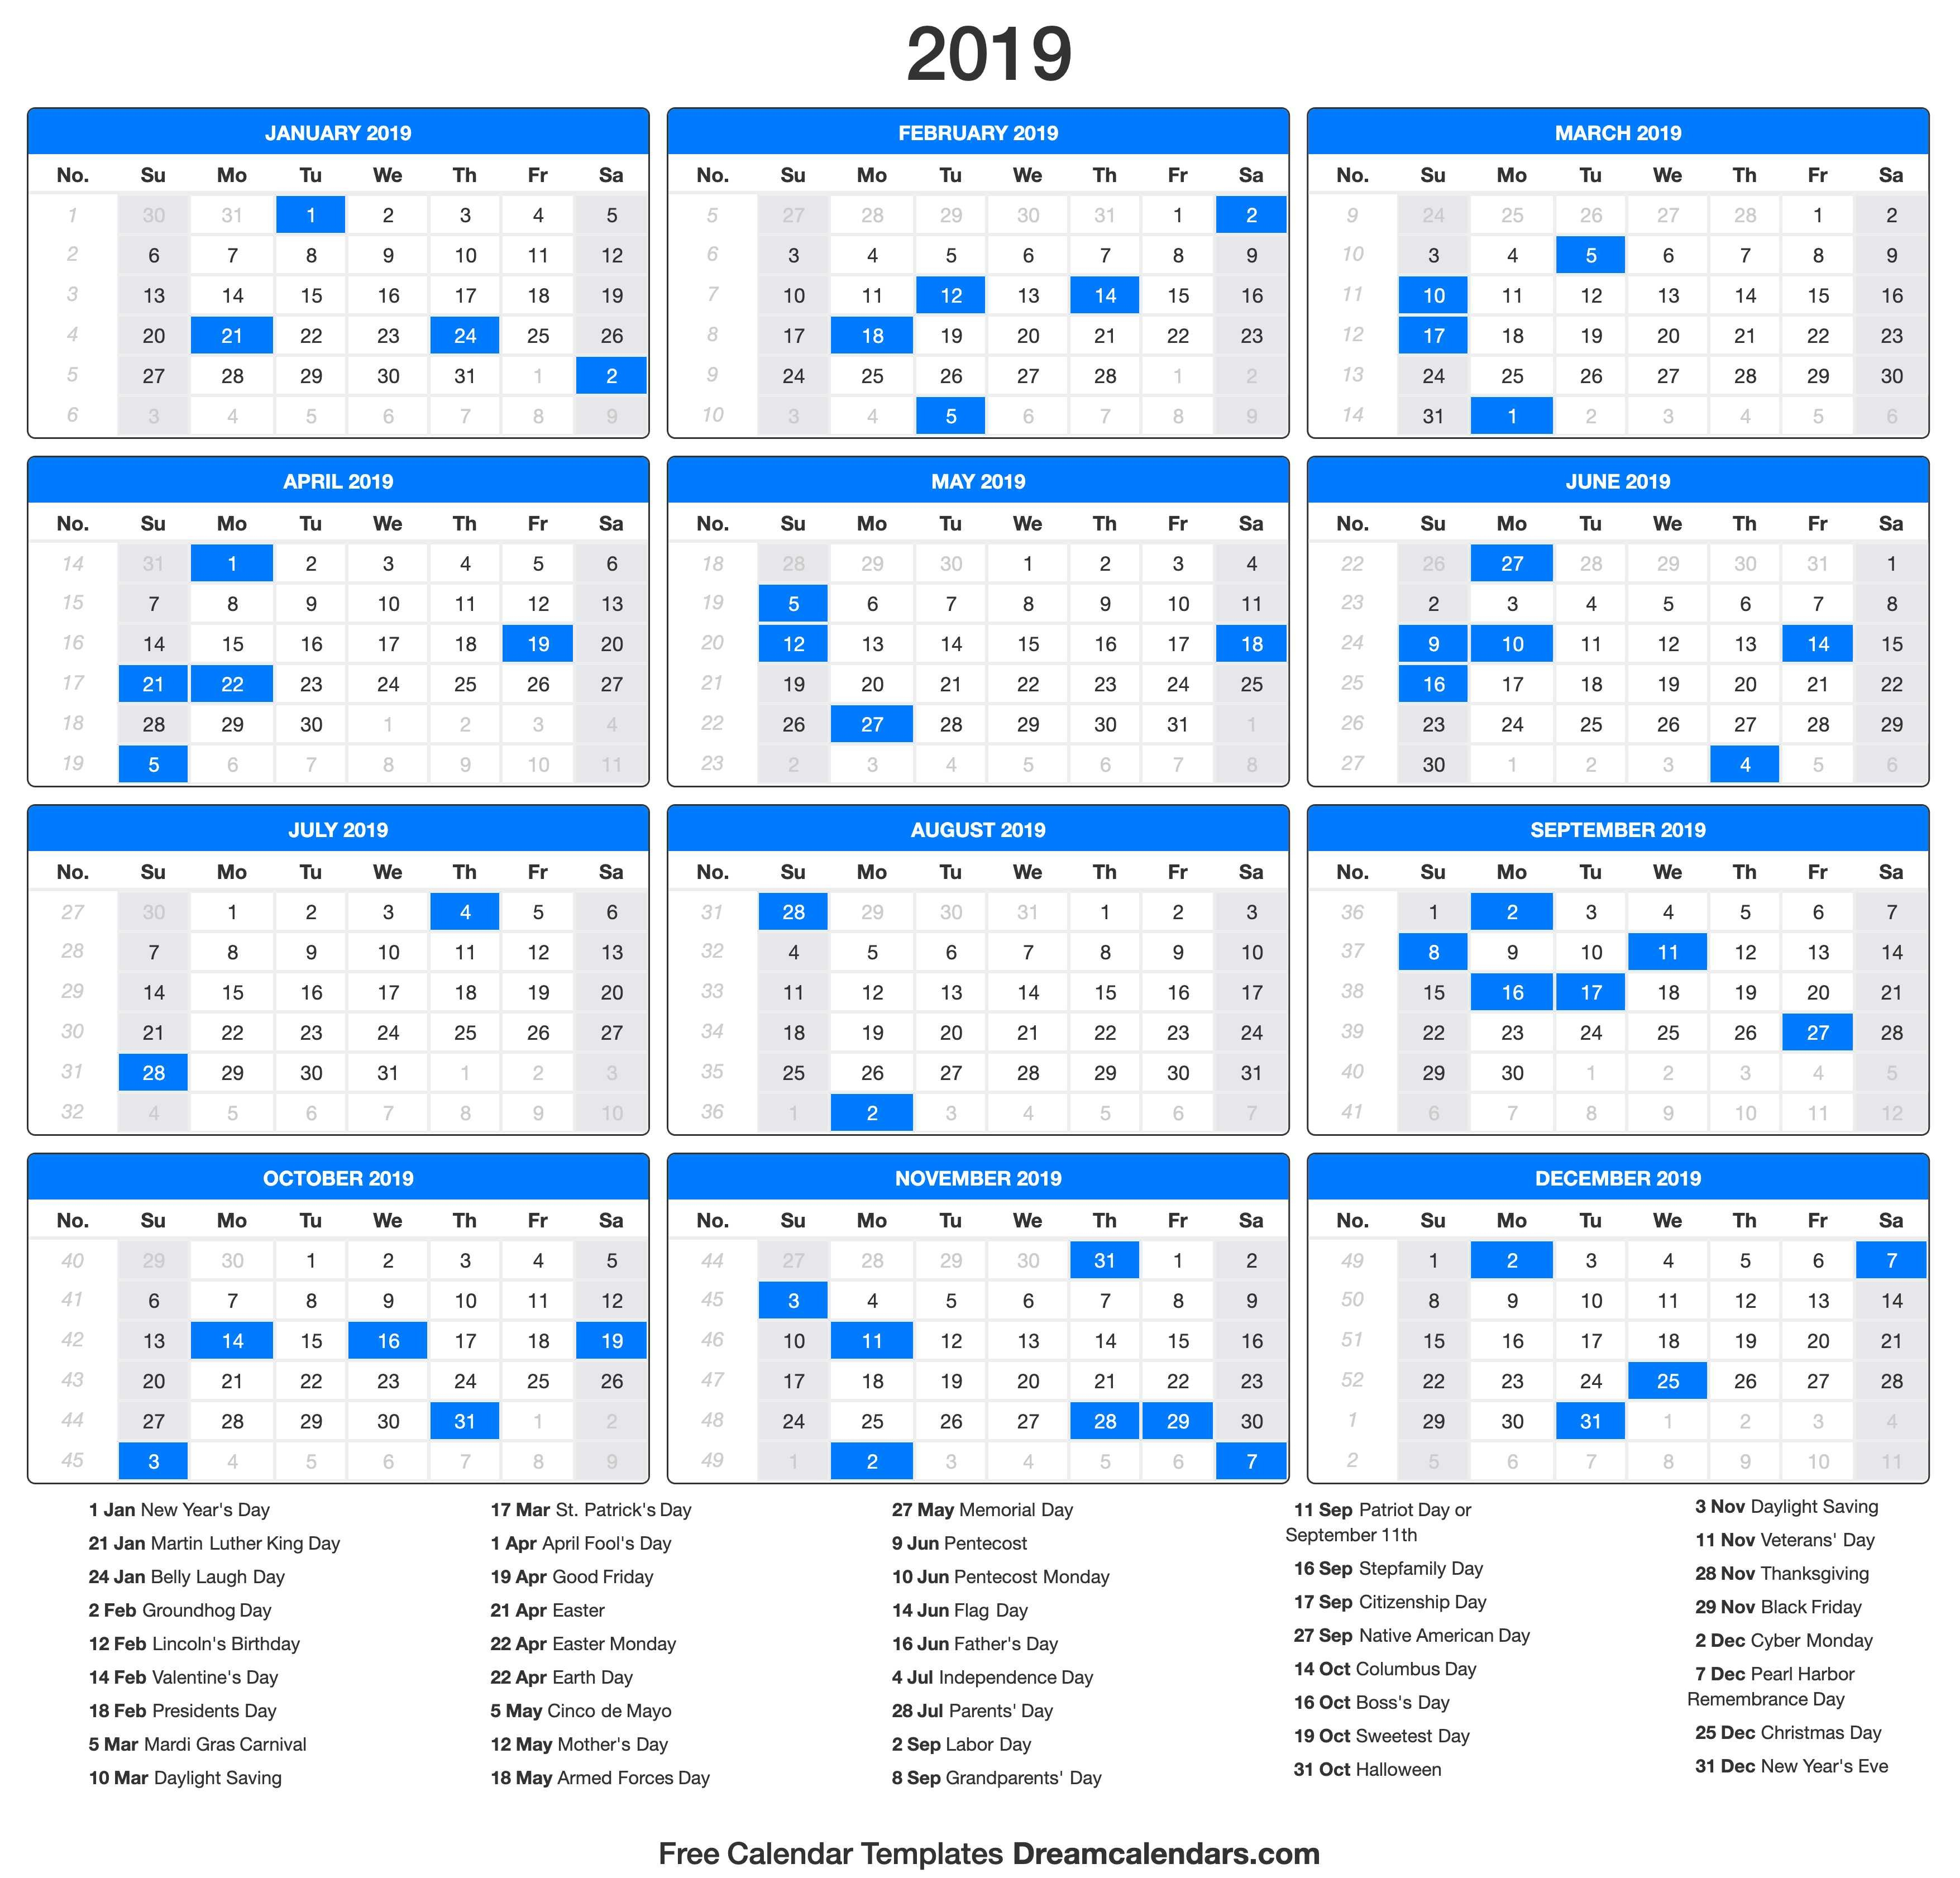 Printable 2019 Calendar - Dream Calendars Calendar 2019 Presidents Day